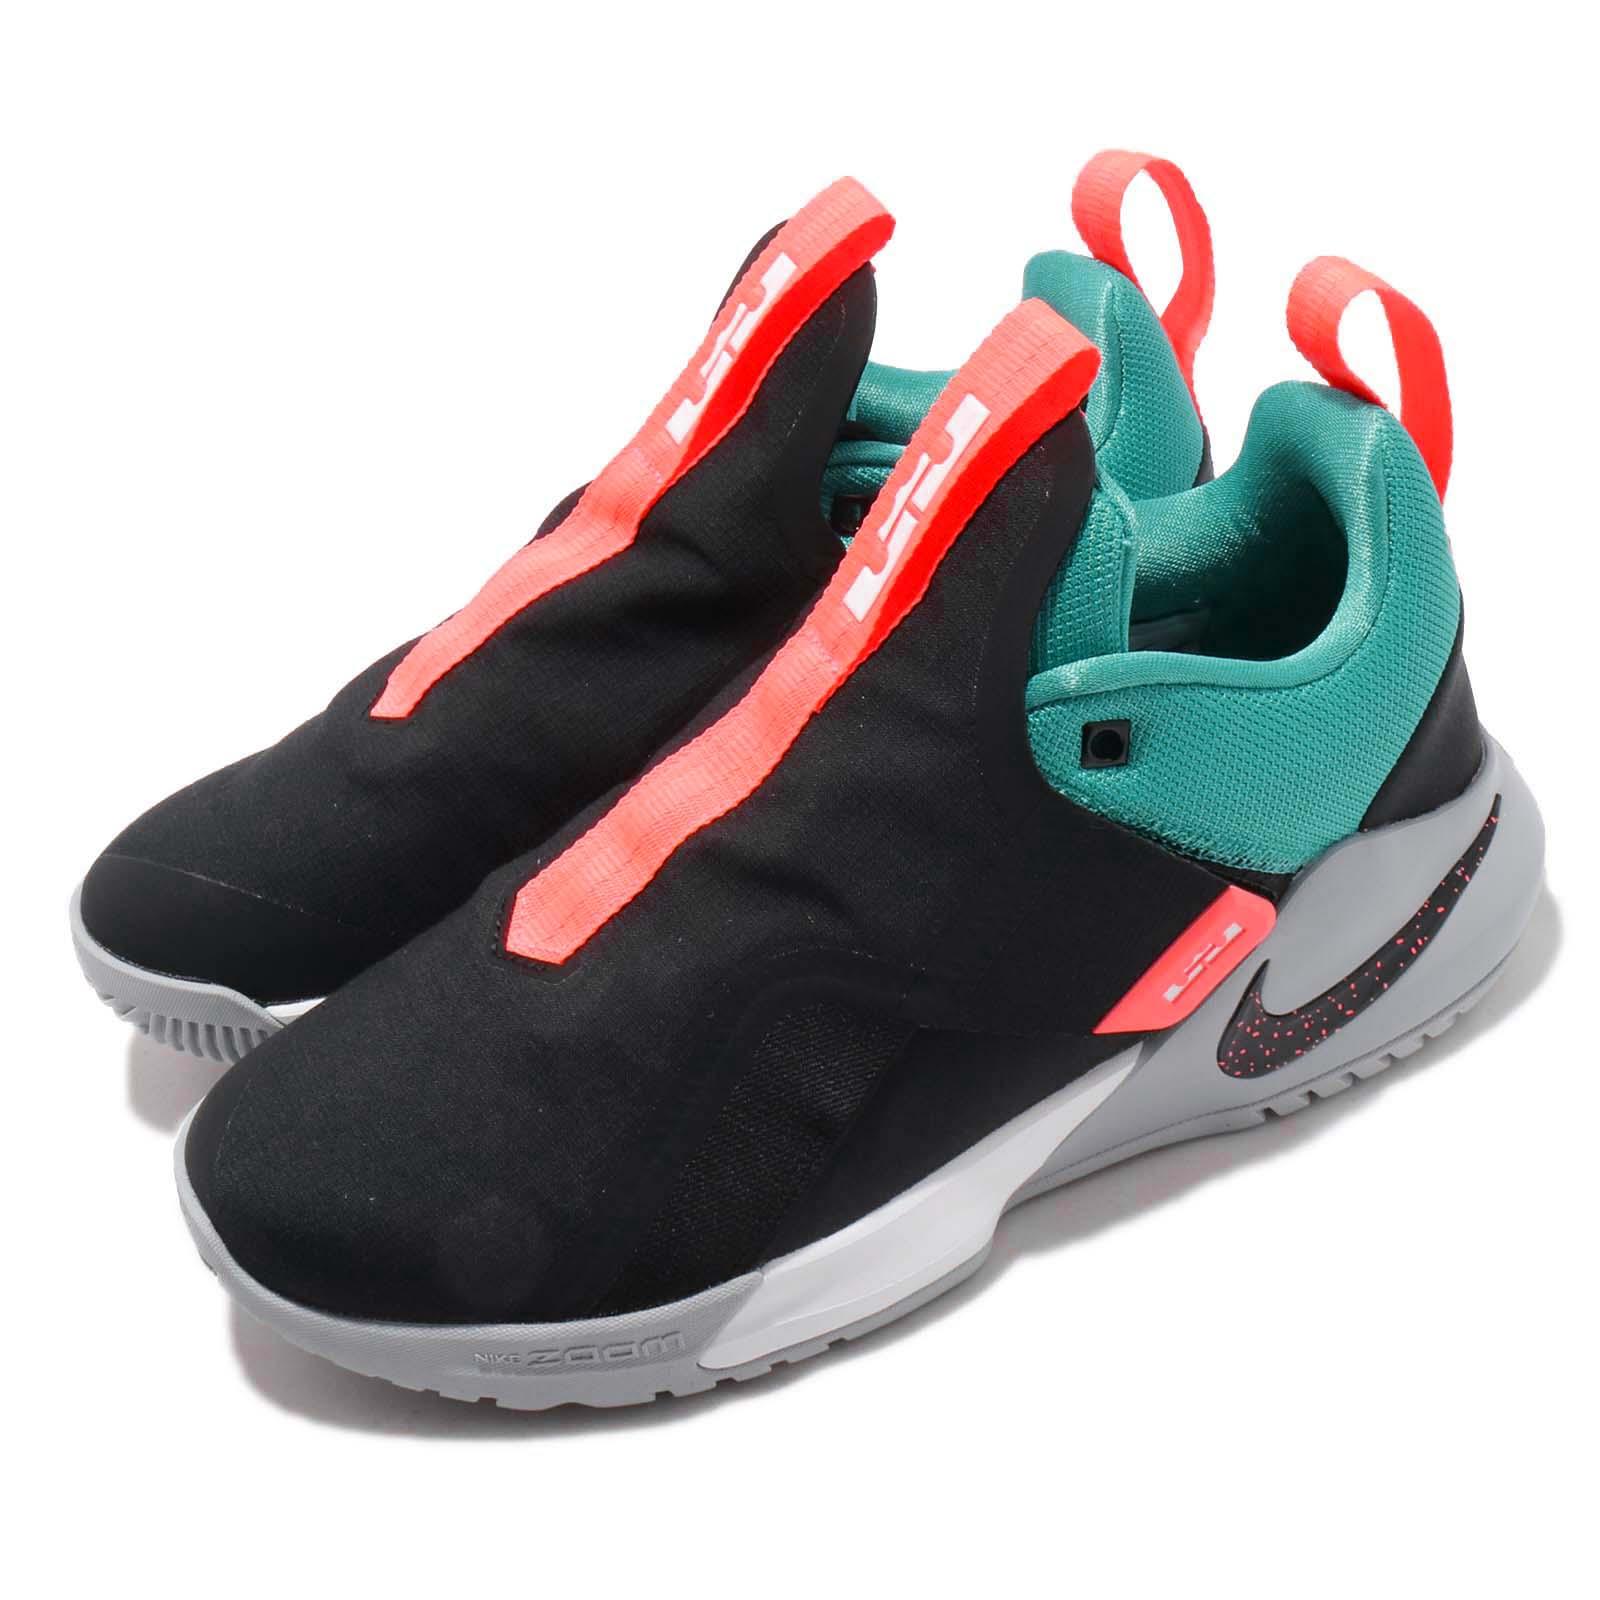 Nike 籃球鞋 Ambassador XI 男鞋 AO2920-005